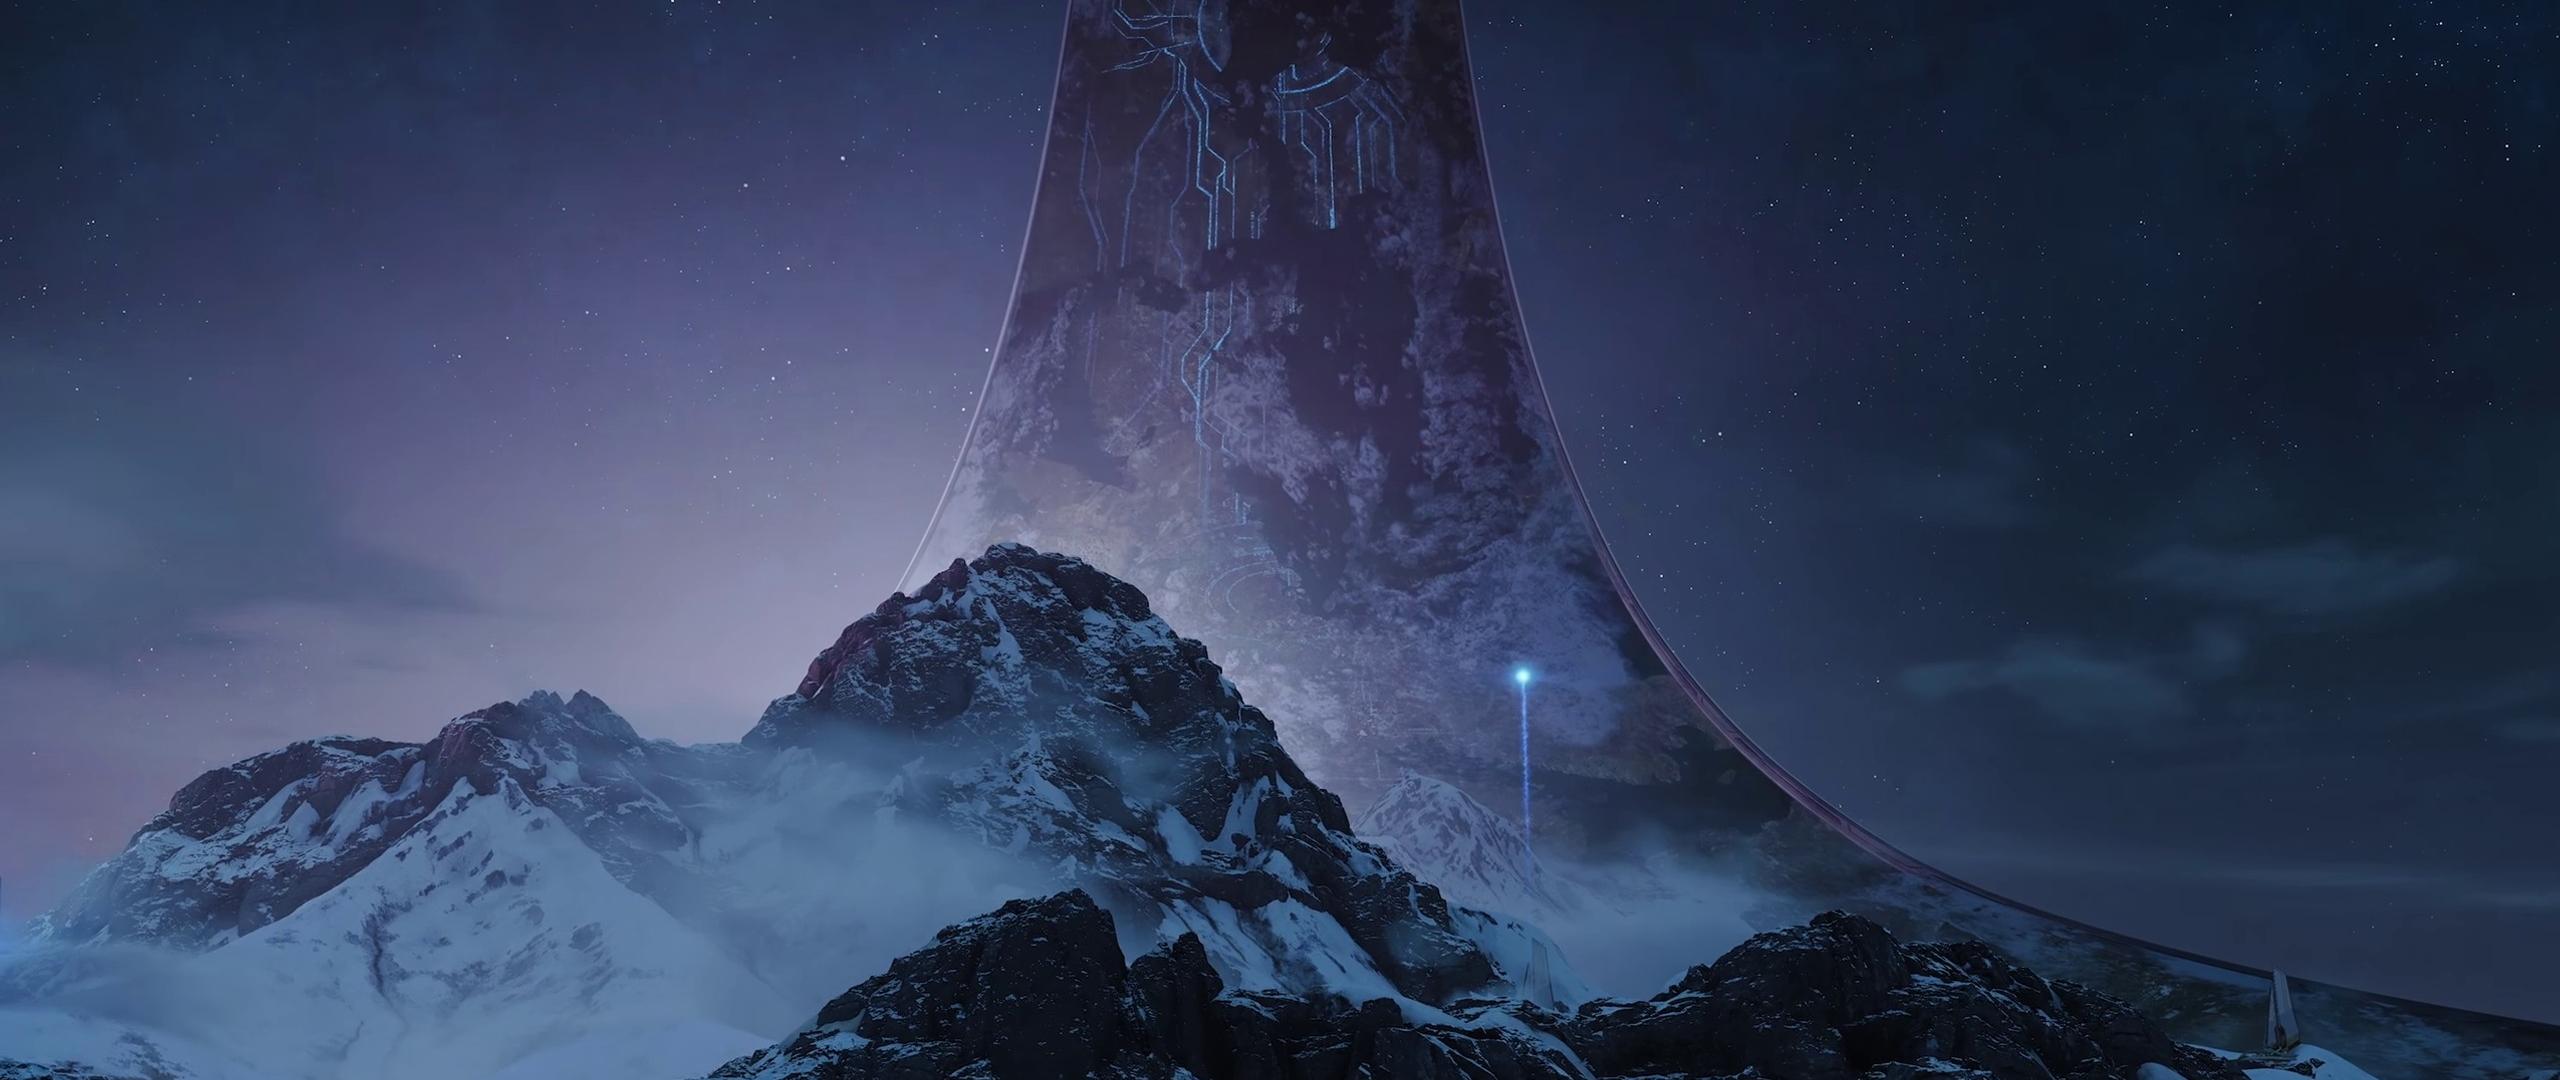 Halo Infinite Video Game Still 2018 Full Hd 2k Wallpaper